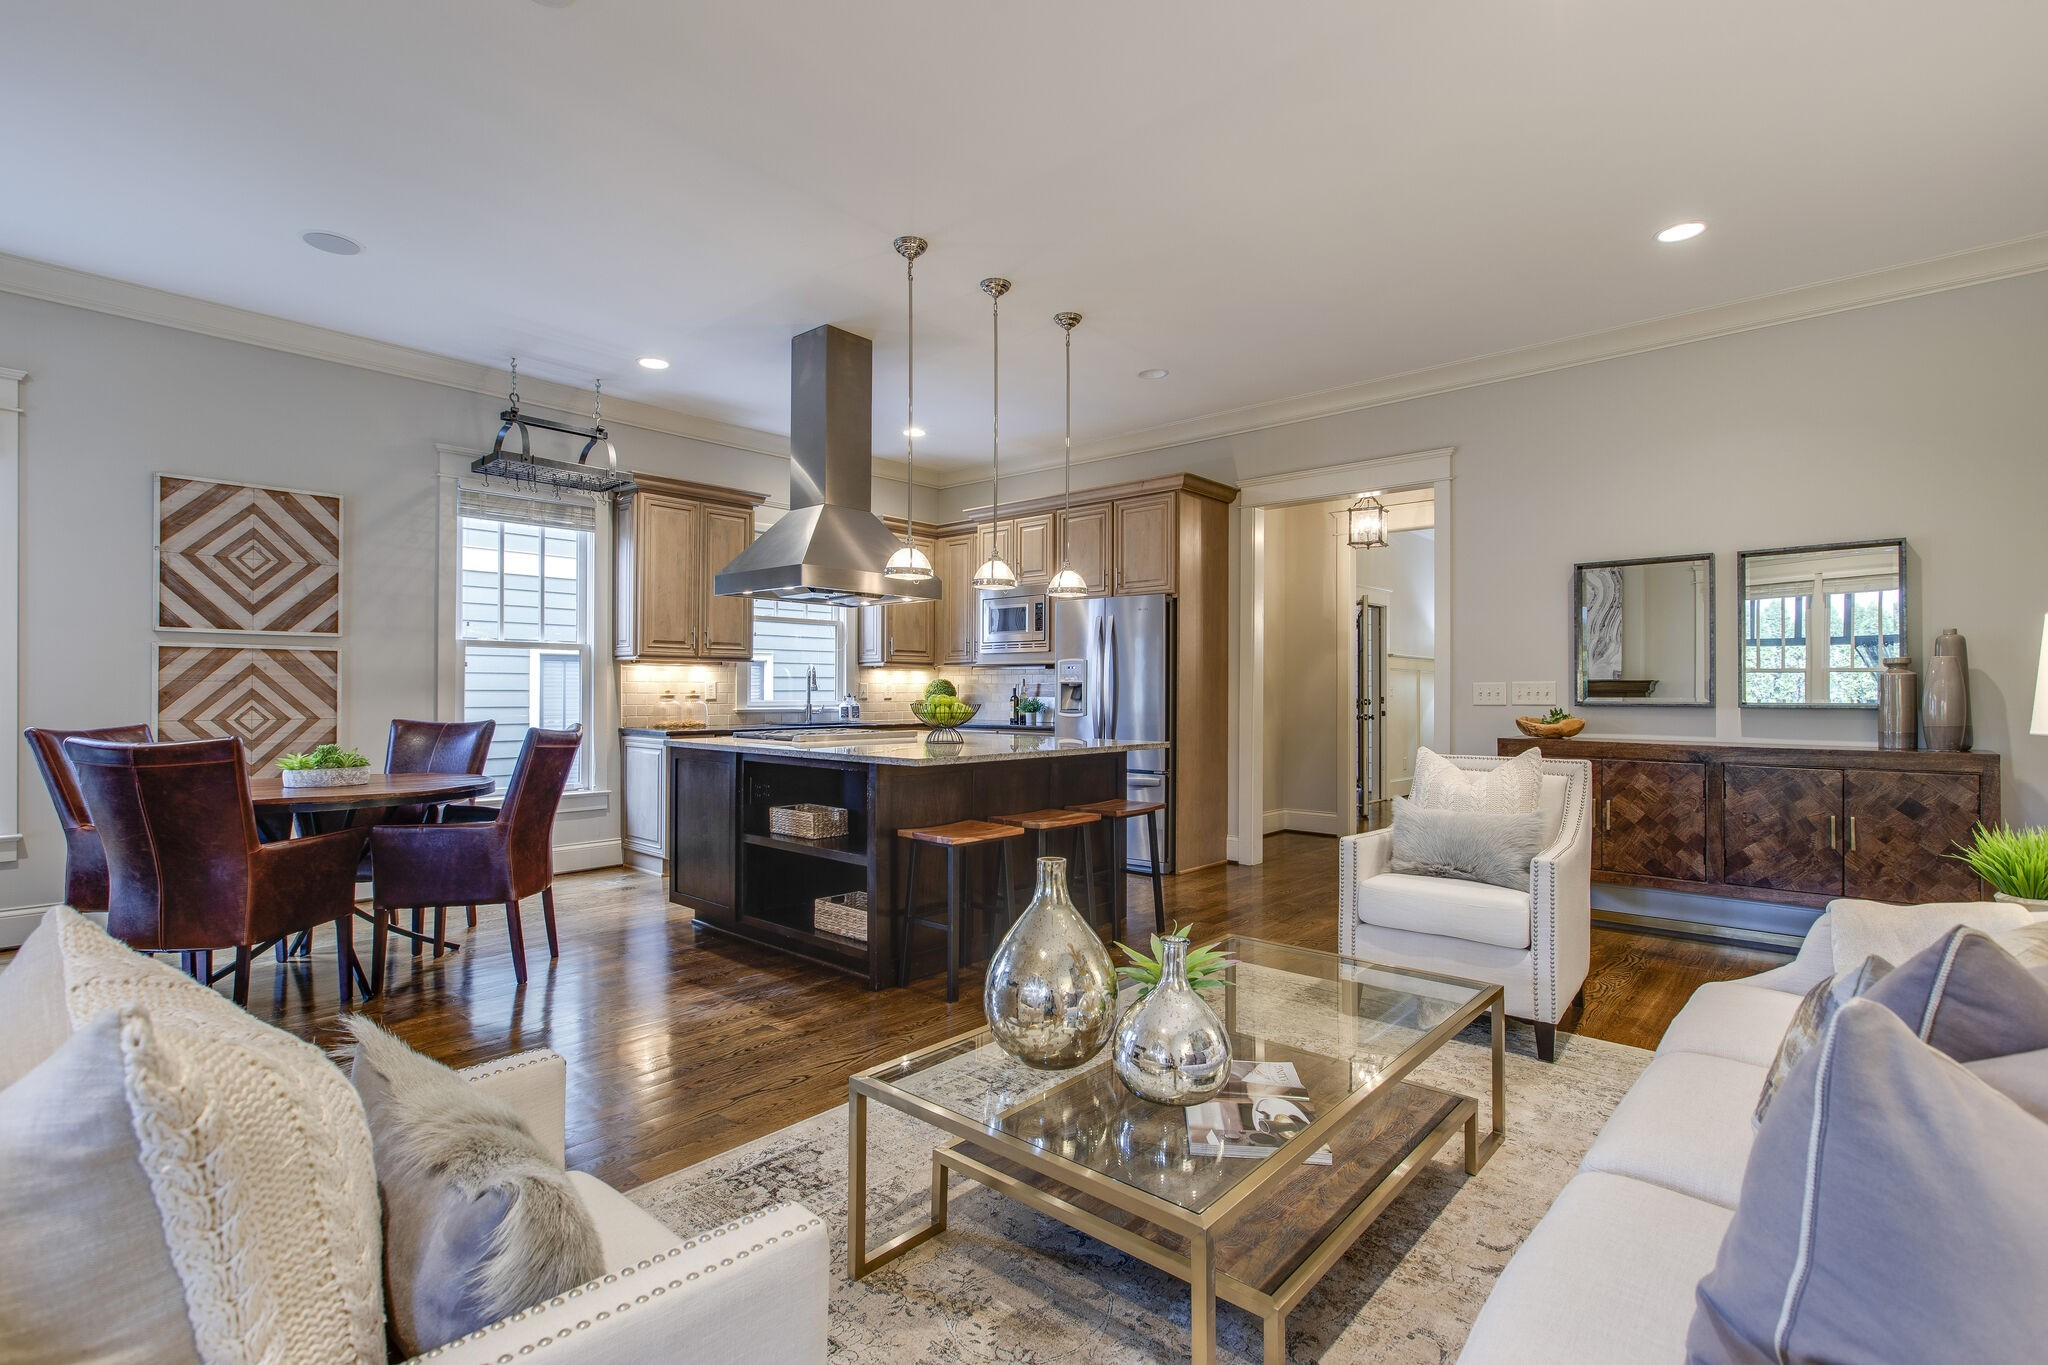 1208A Linden Ave Property Photo - Nashville, TN real estate listing